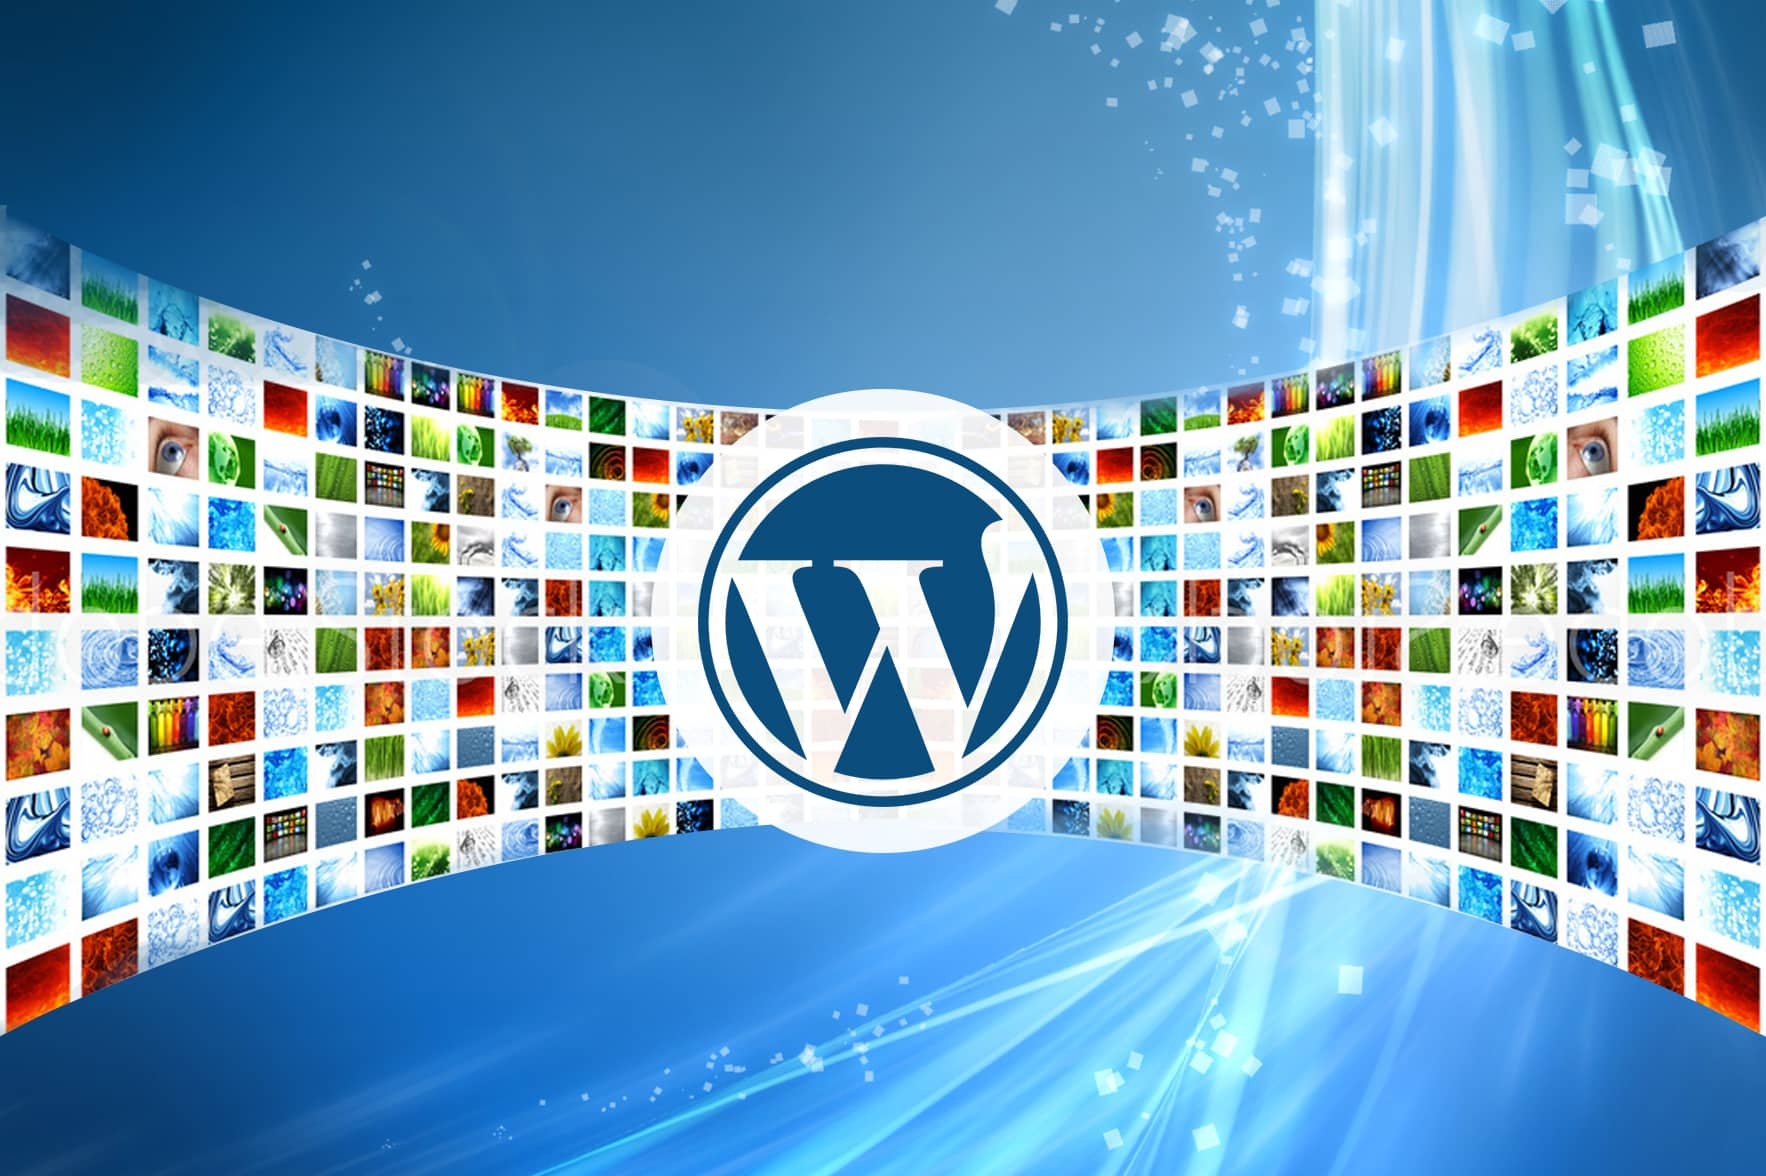 wordpress background images